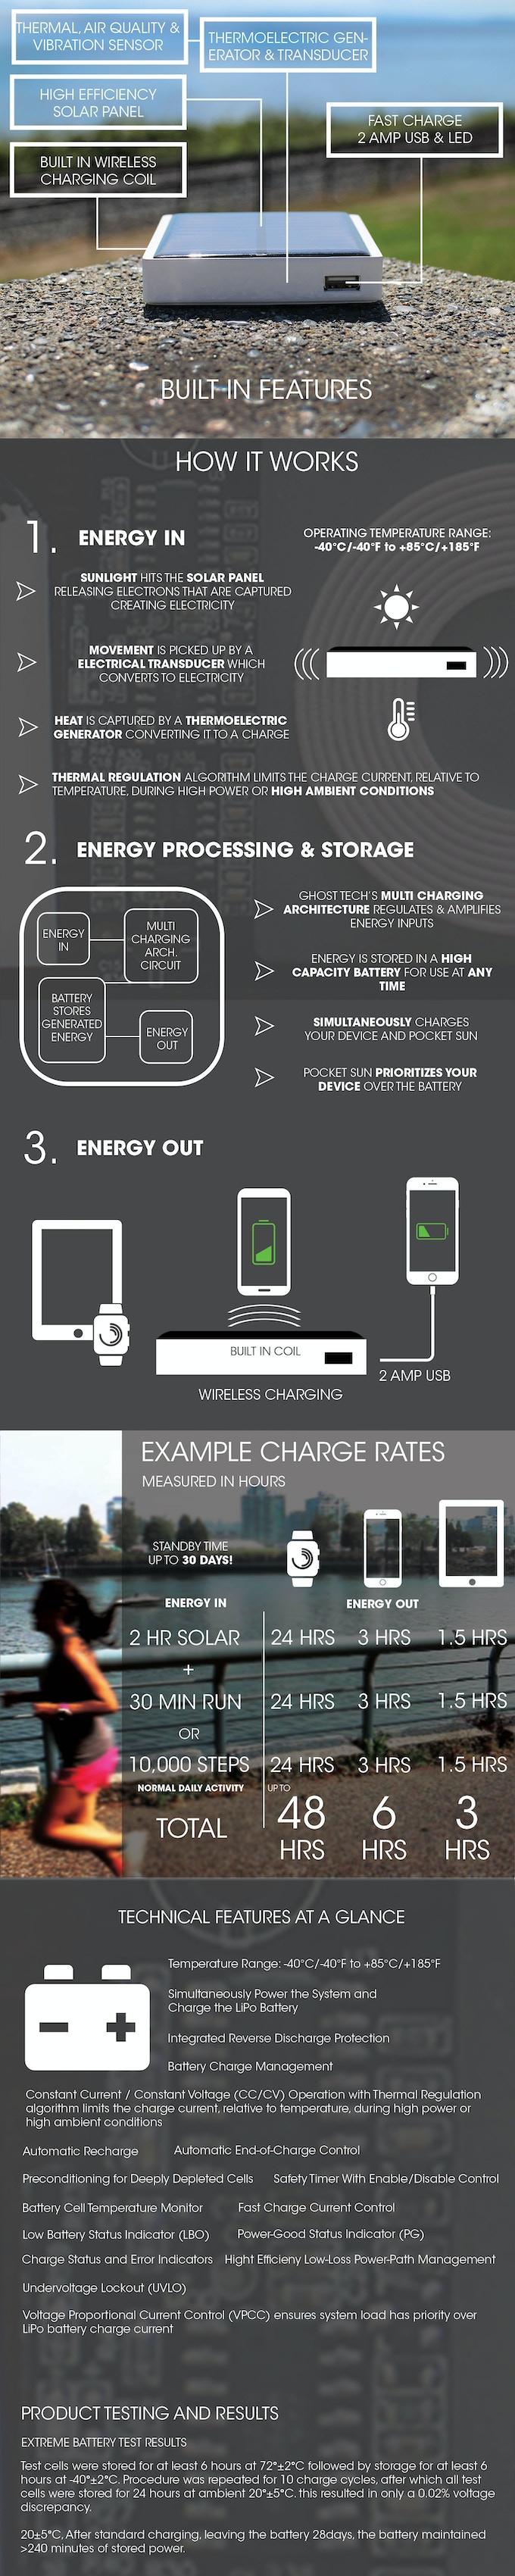 Pocket Sun Product Specs